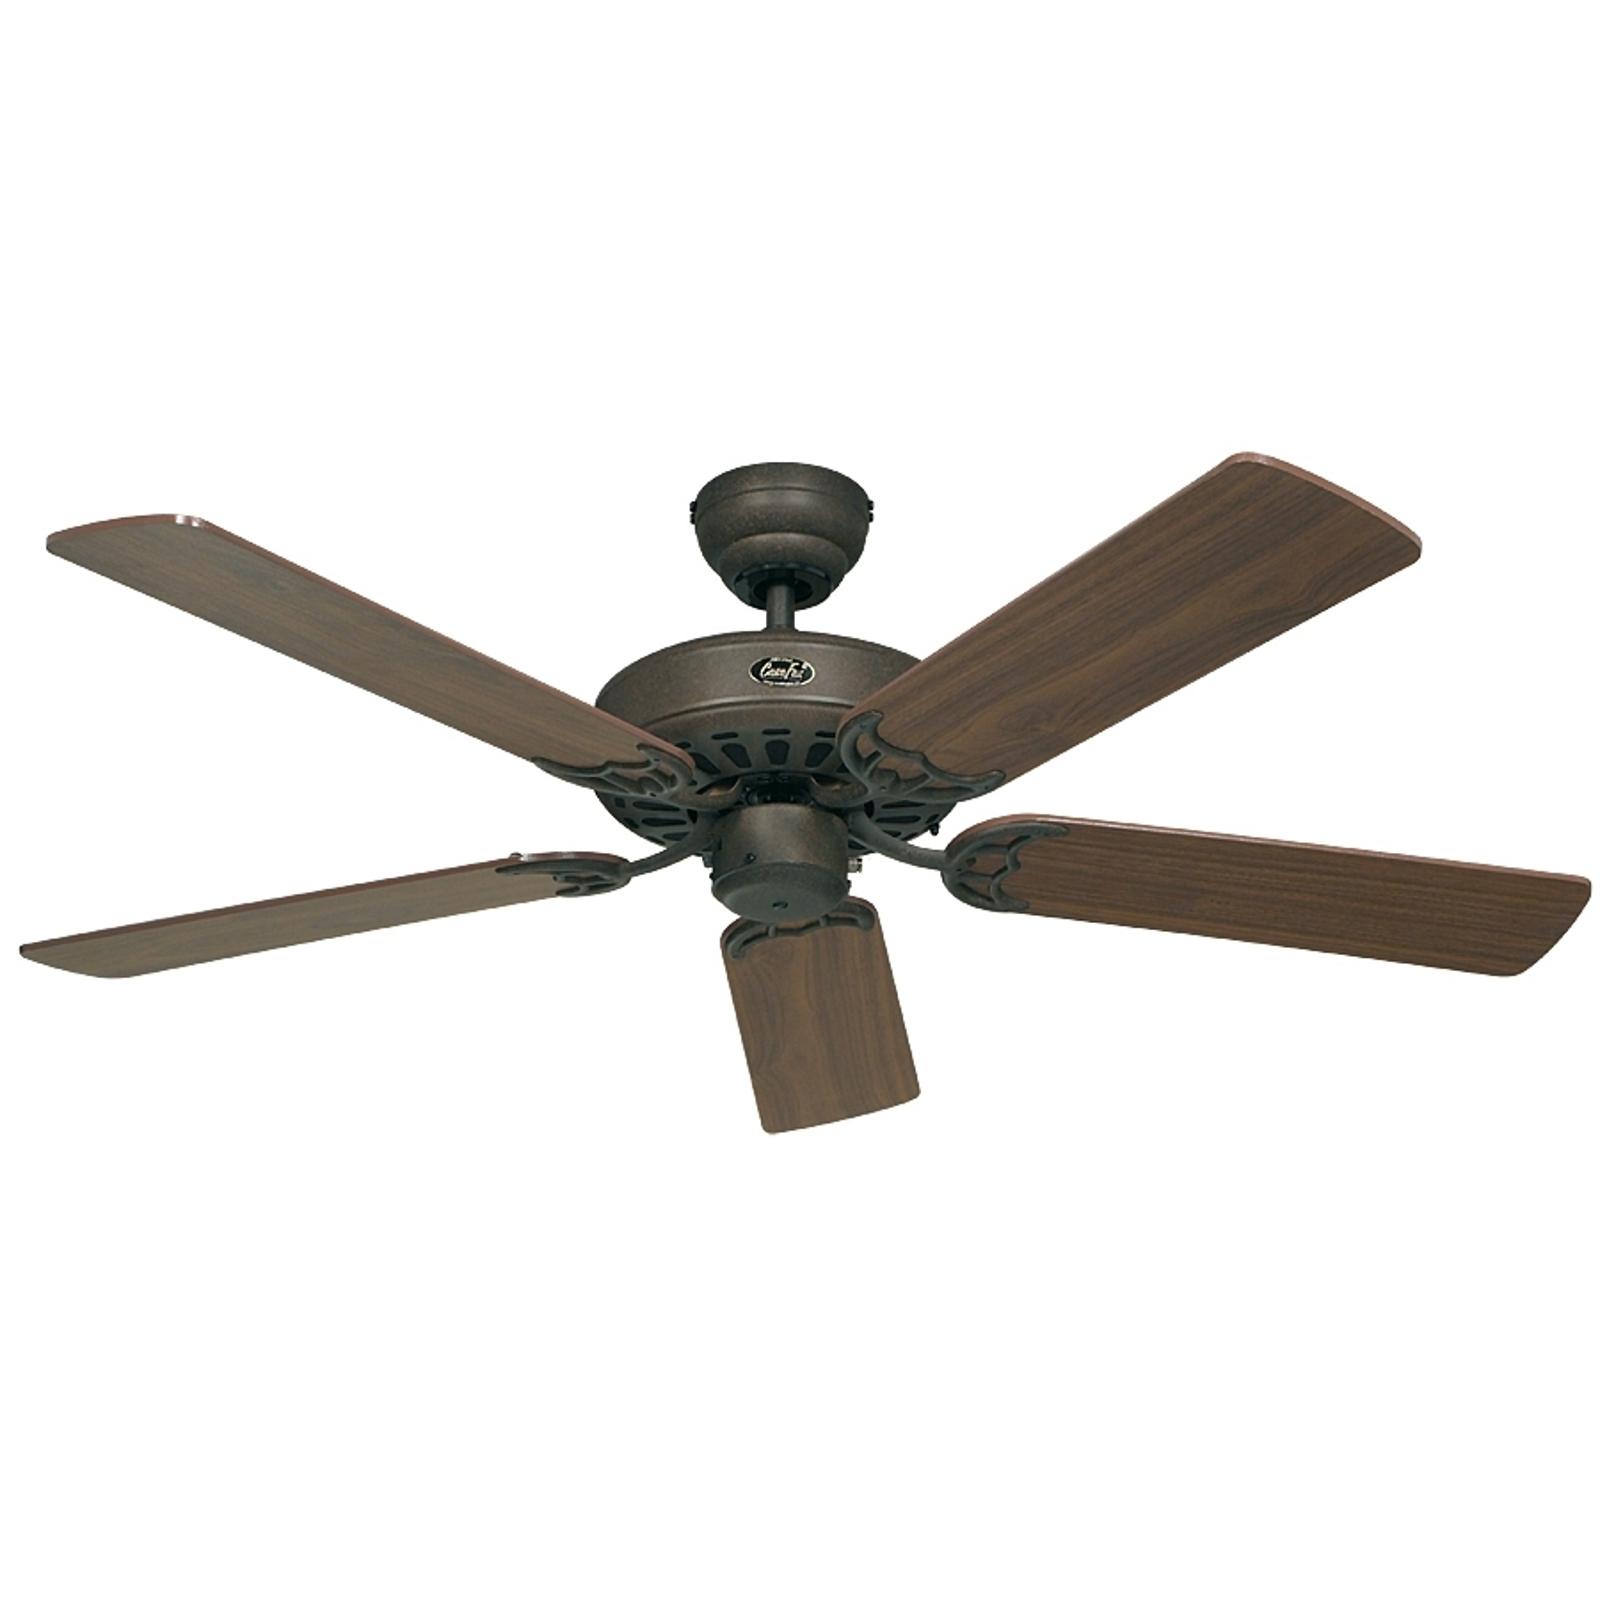 Stropný ventilátor Classic Royal 132 hnedý/orech_2015002_1